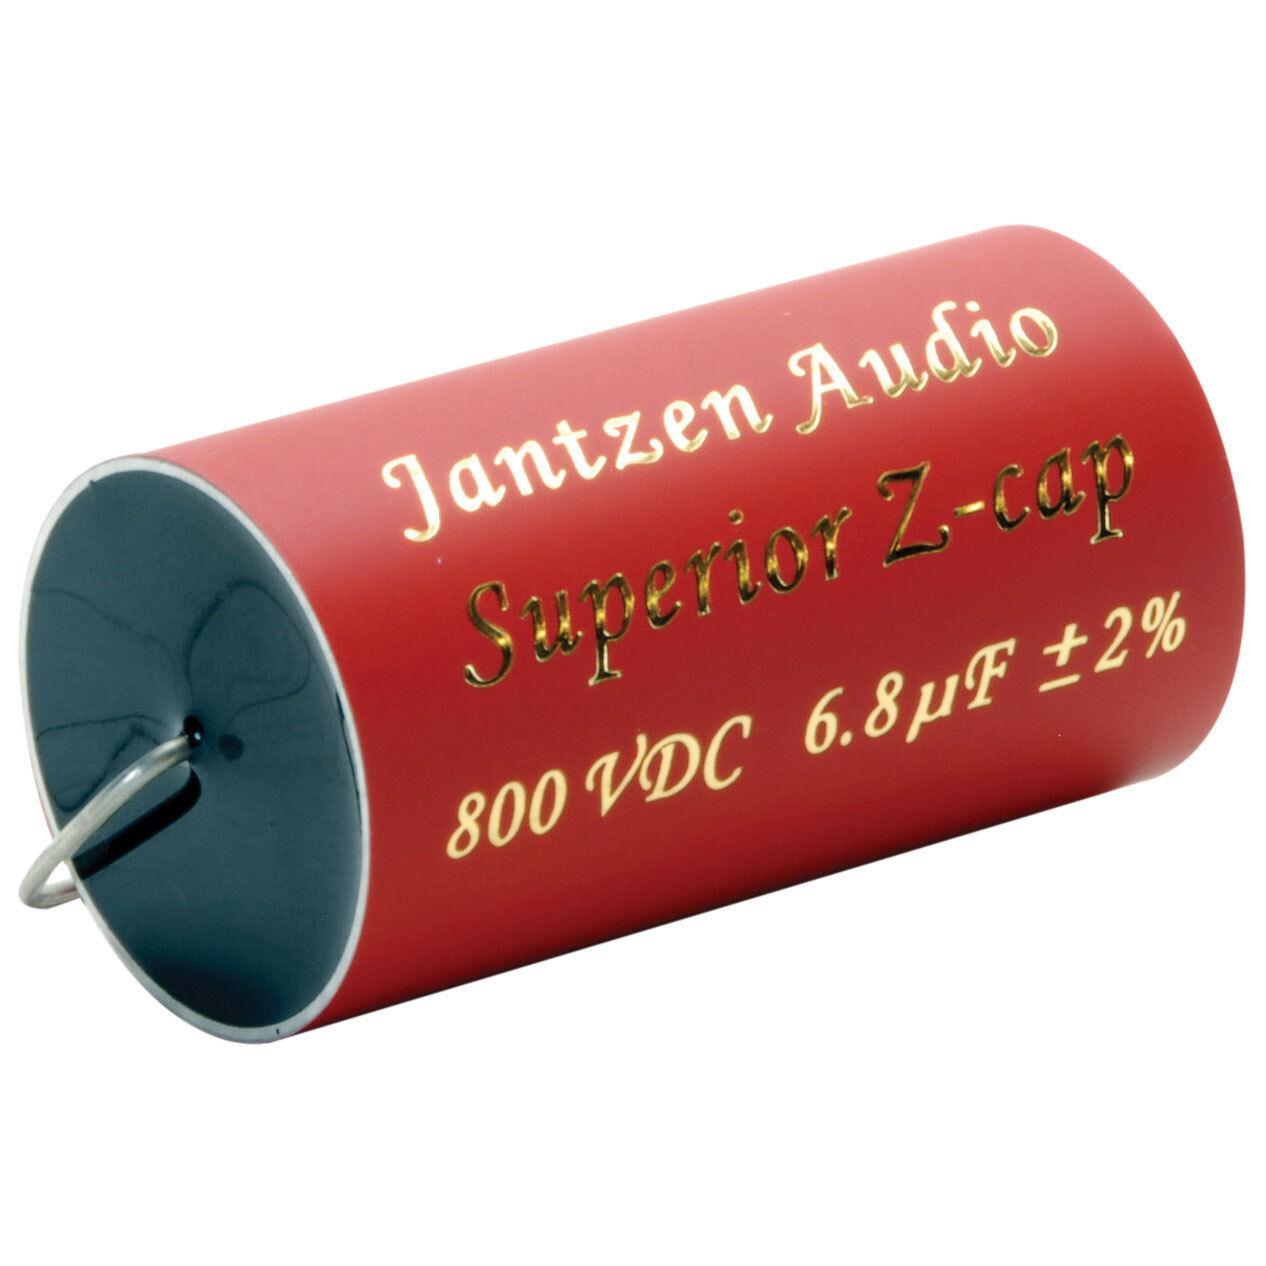 Jantzen 0570 6.8uF 800V Z-Superior Capacitor